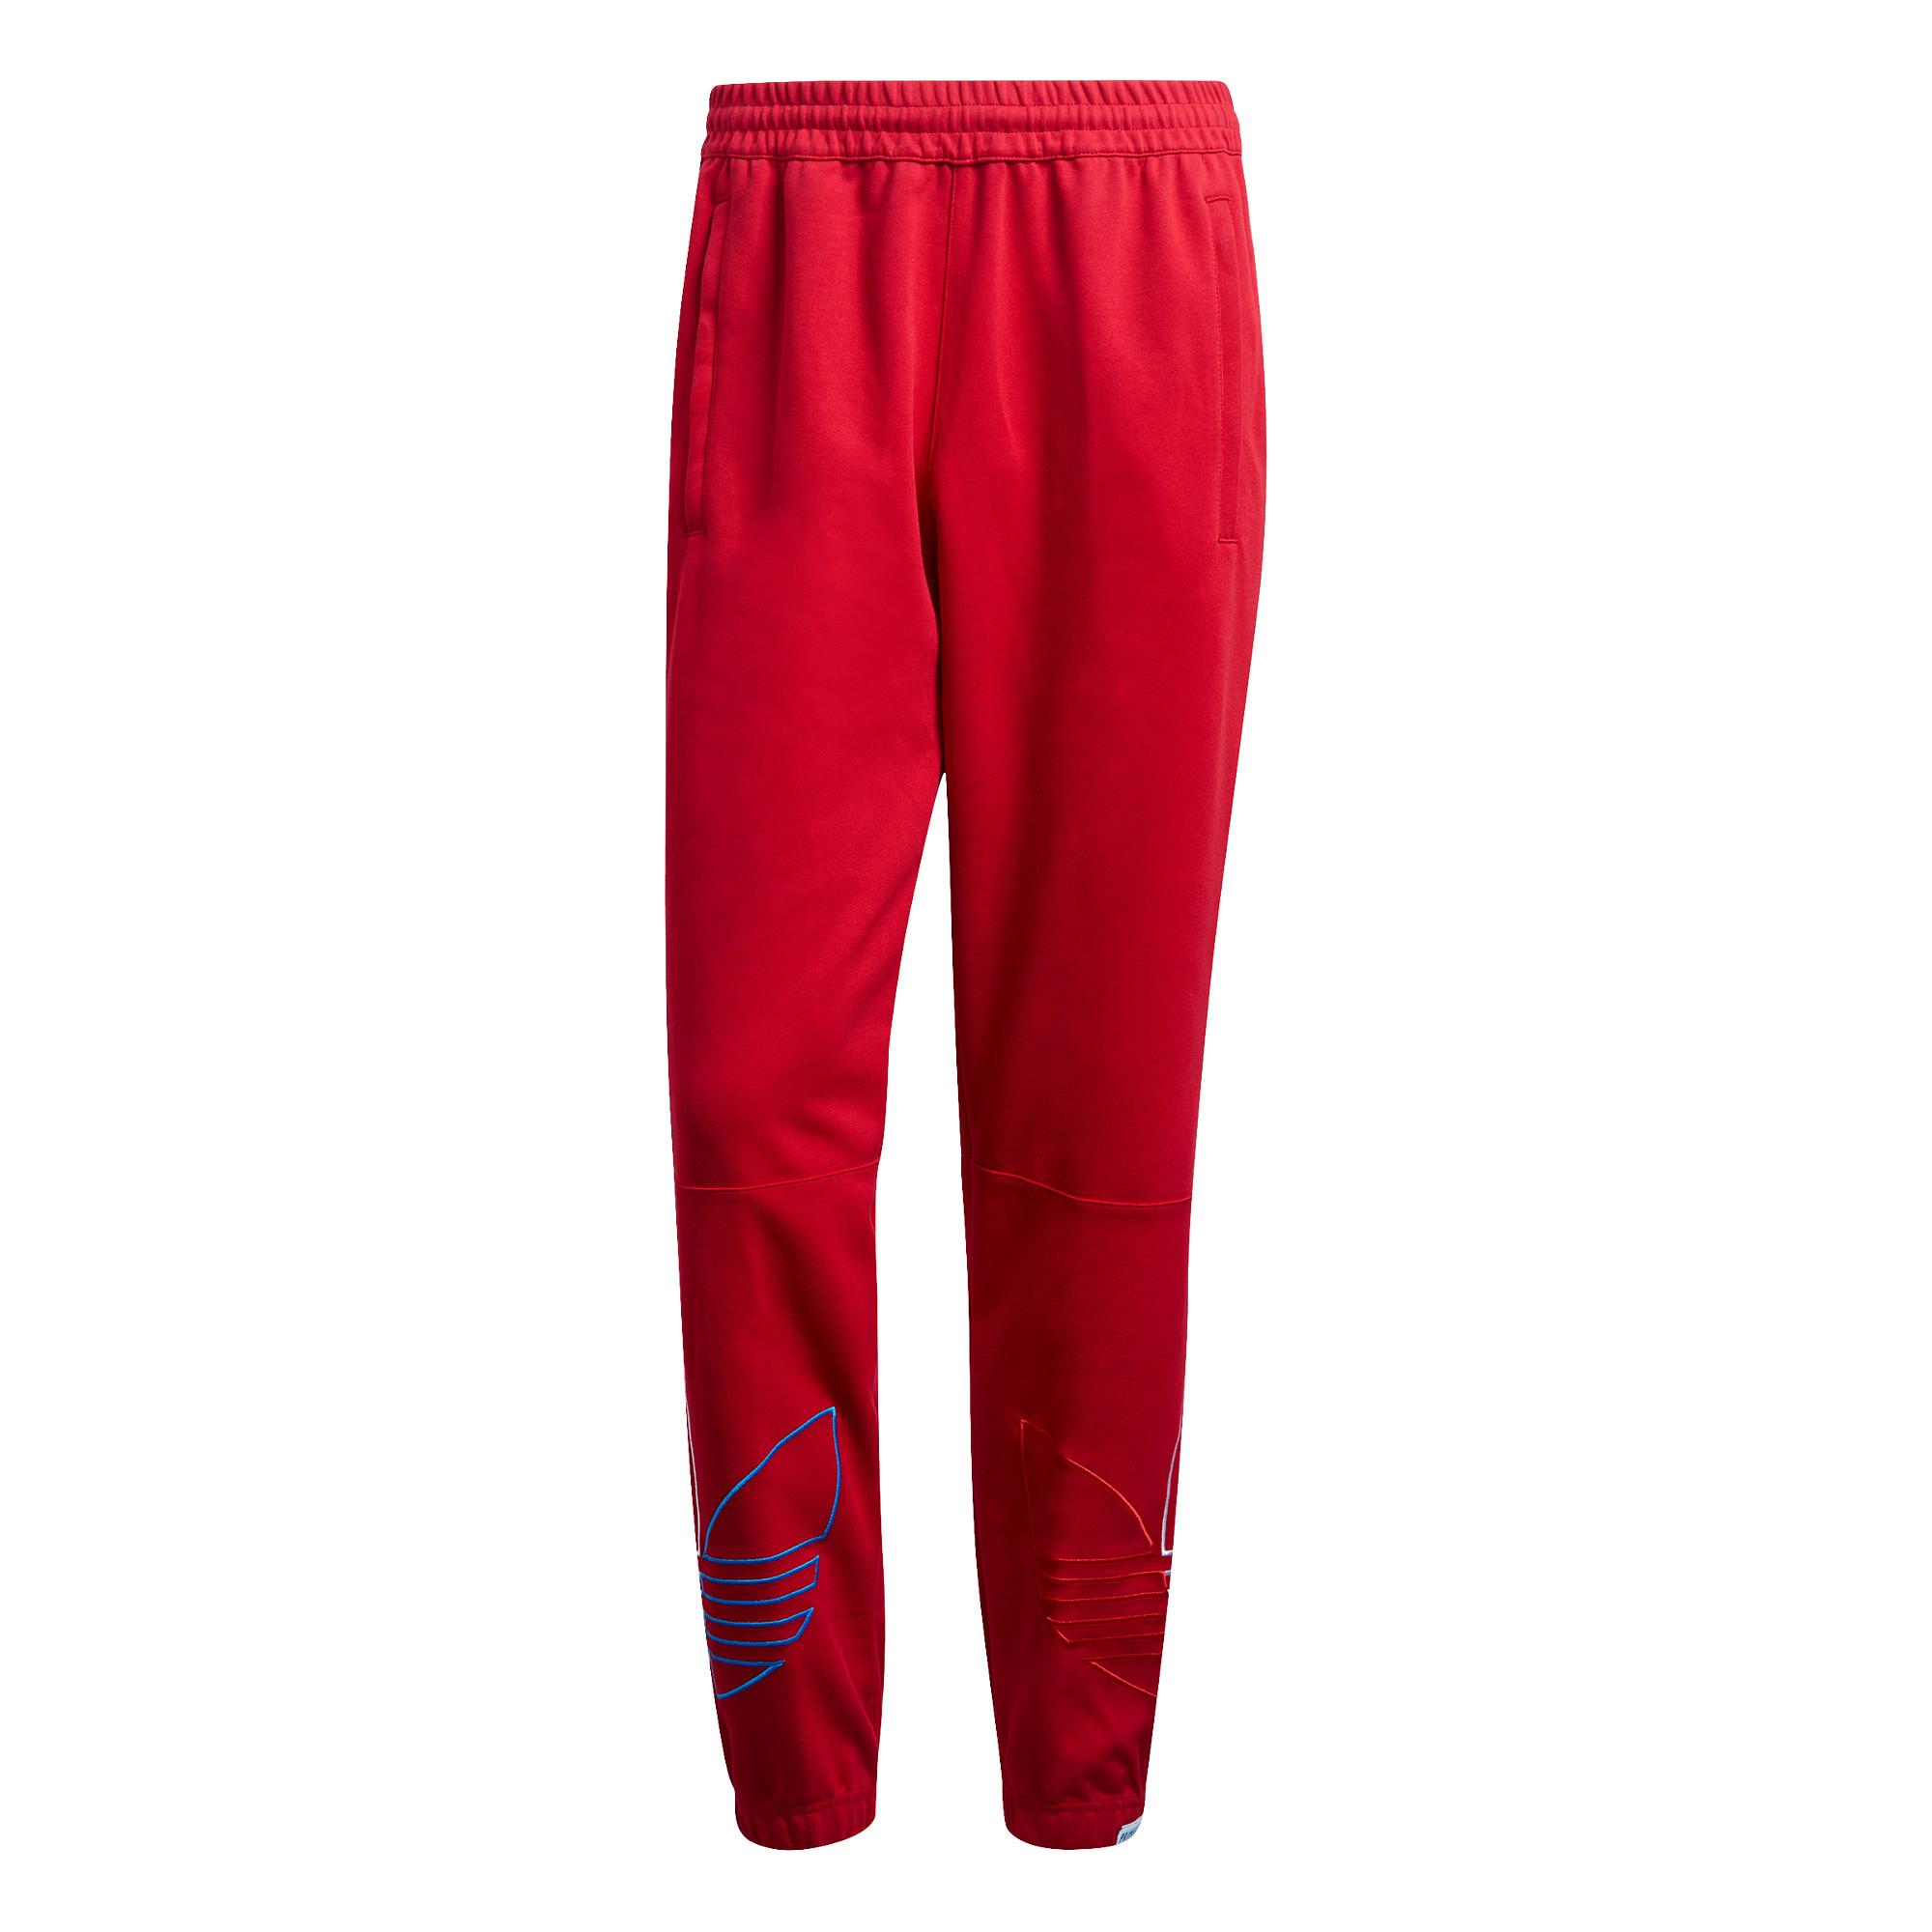 Pantaloni tuta adicolor, Rosso, large image number 0